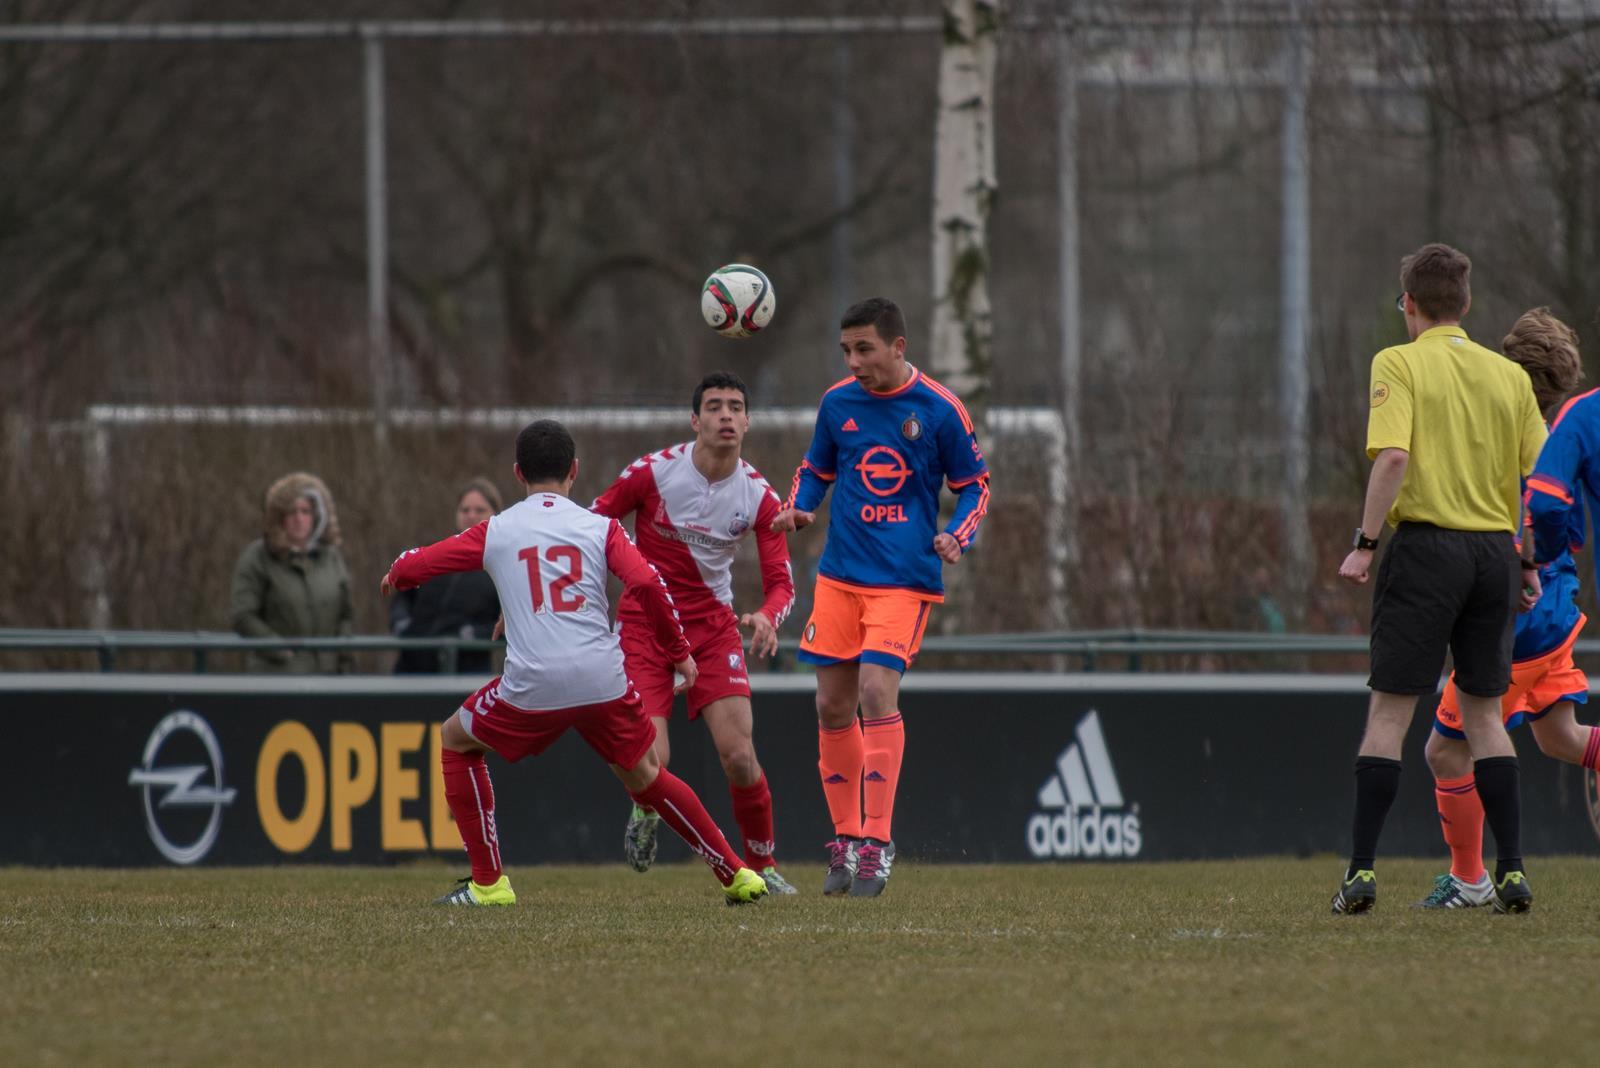 Feyenoord vs Utrecht u16 by Hans Warnaar